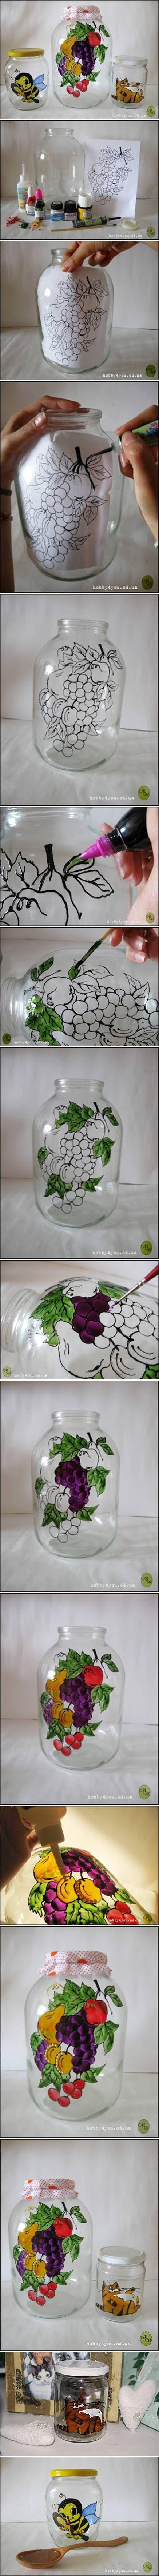 DIY Jar Art - craft ideas - easy decorations